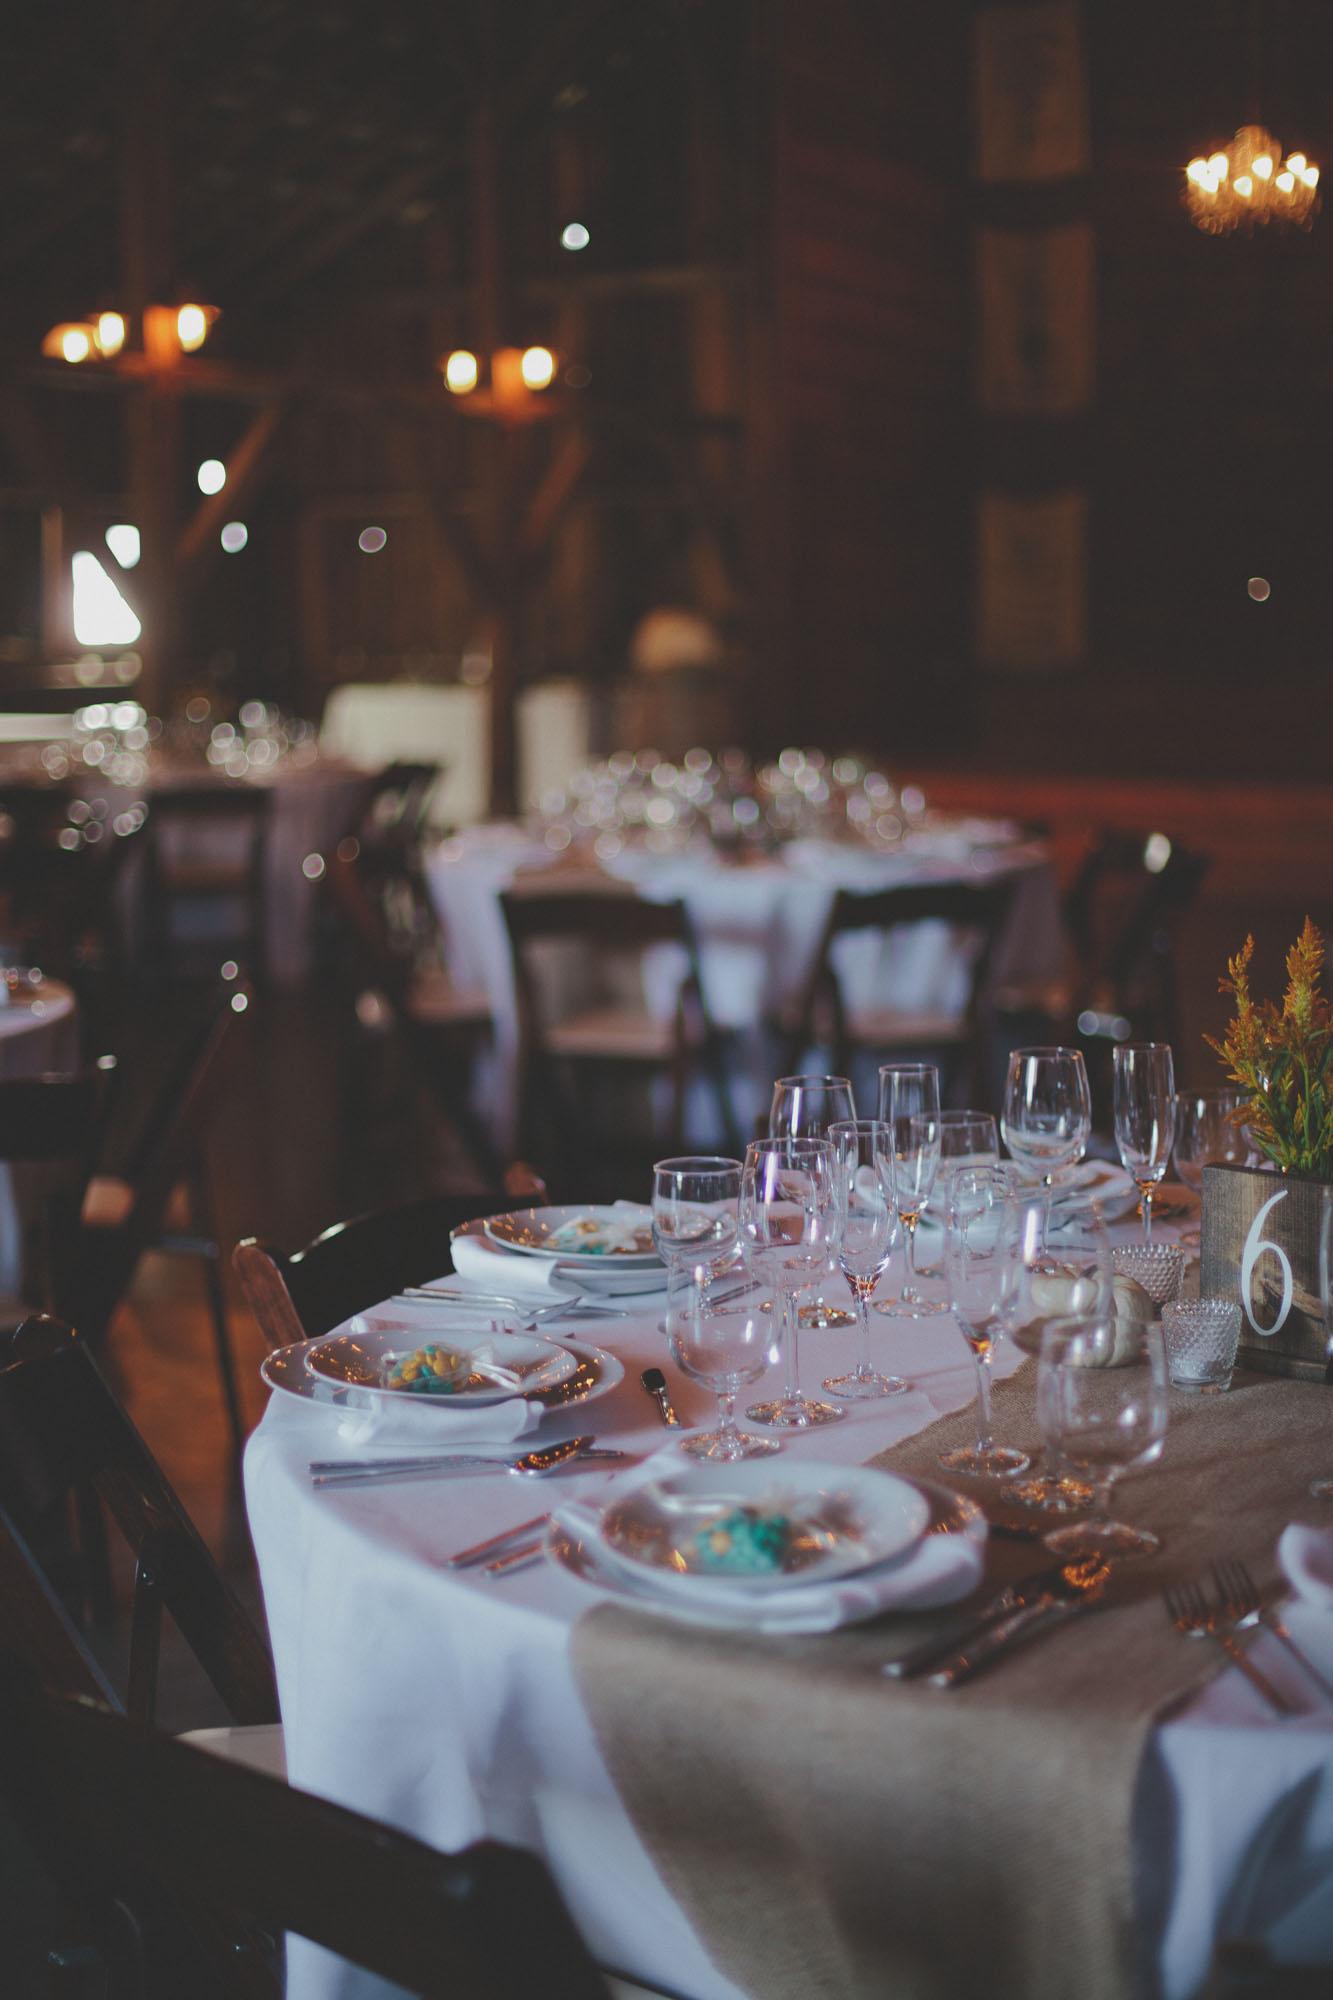 Gretchen_Gause_Petaluma_Olympias_Valley_Wedding_Photo-148.jpg